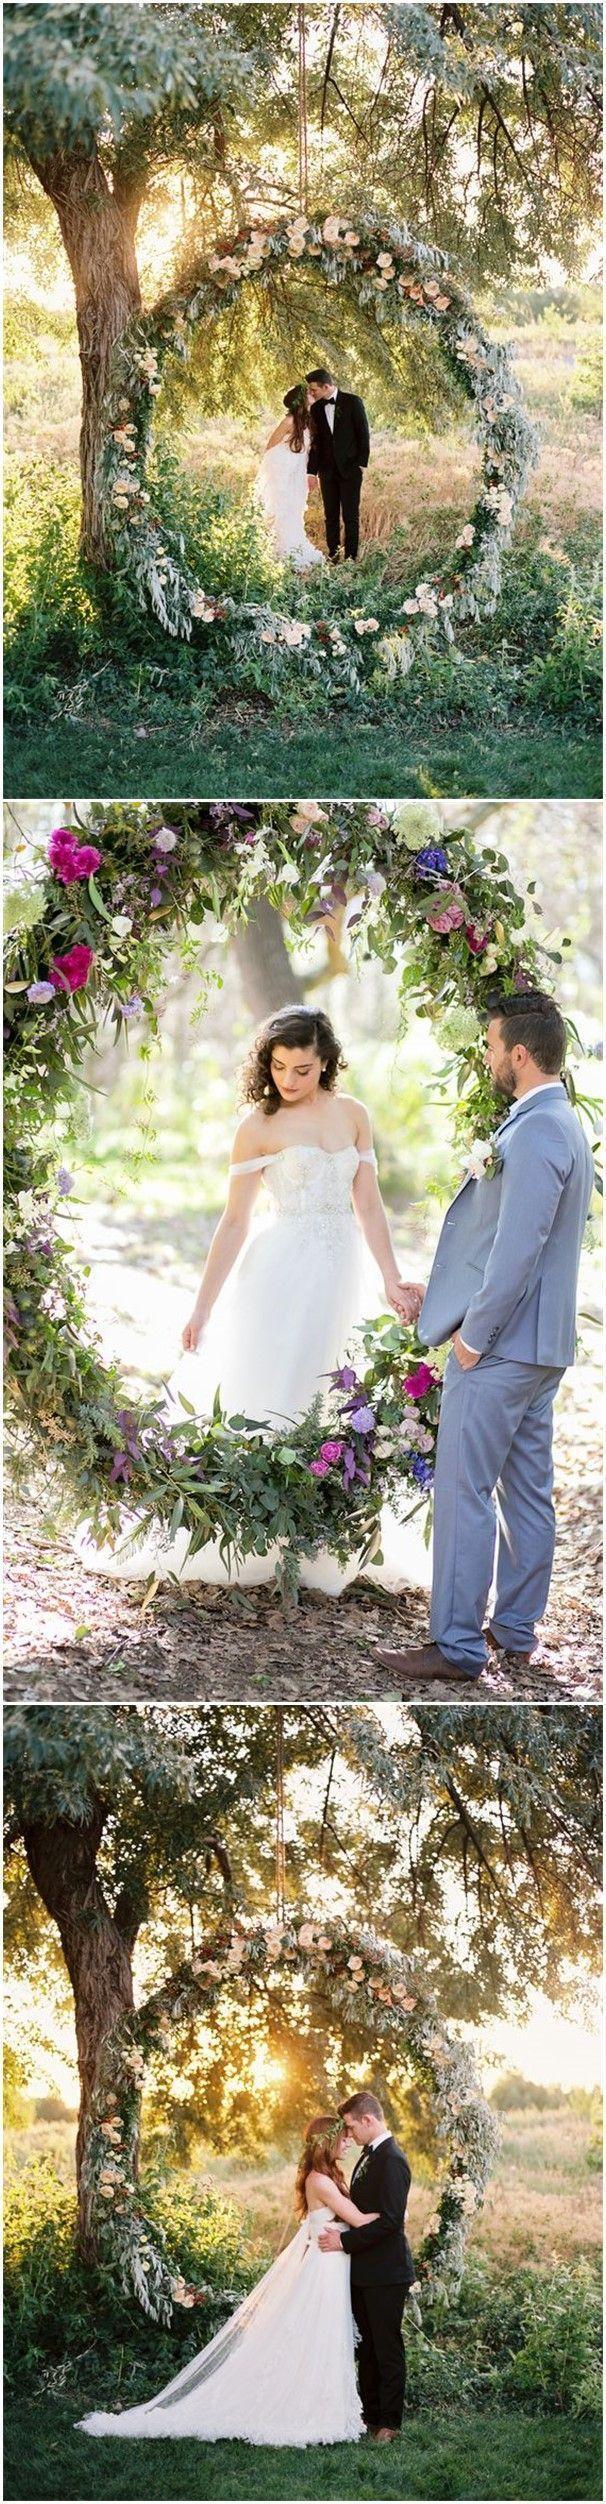 best wedding ideas images on pinterest decor wedding wedding